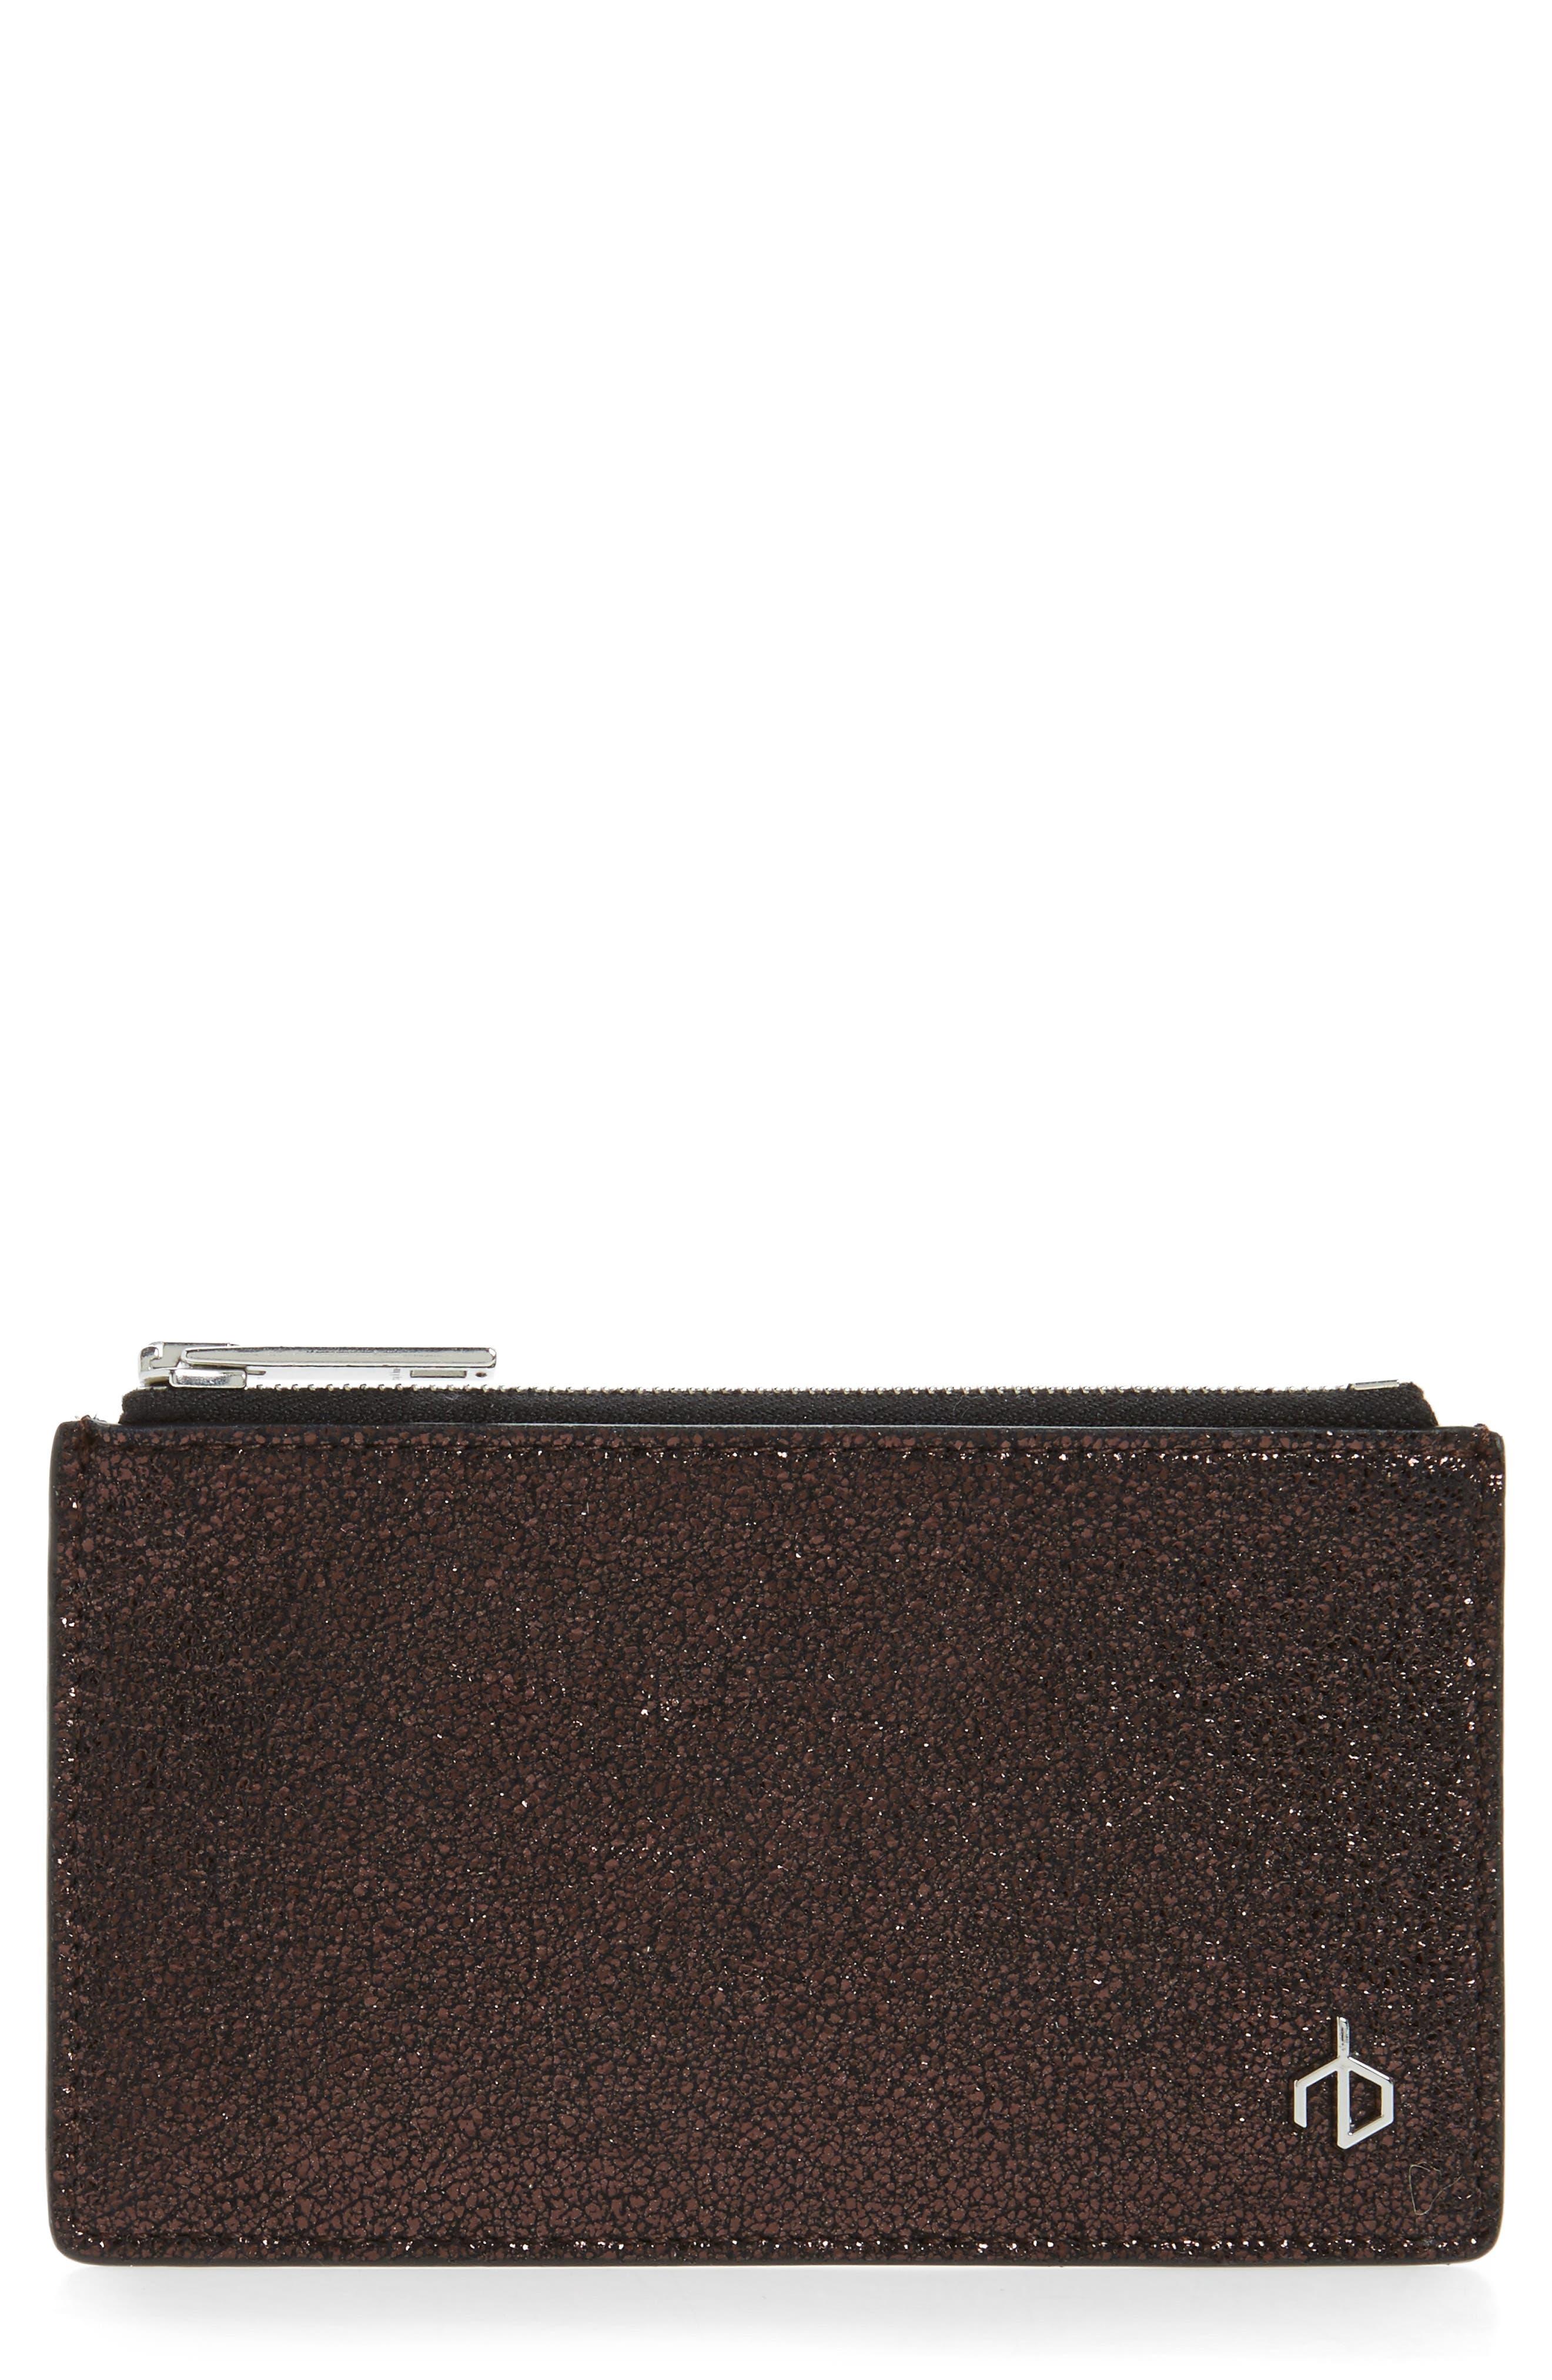 Metallic Leather Card Case,                         Main,                         color, 220